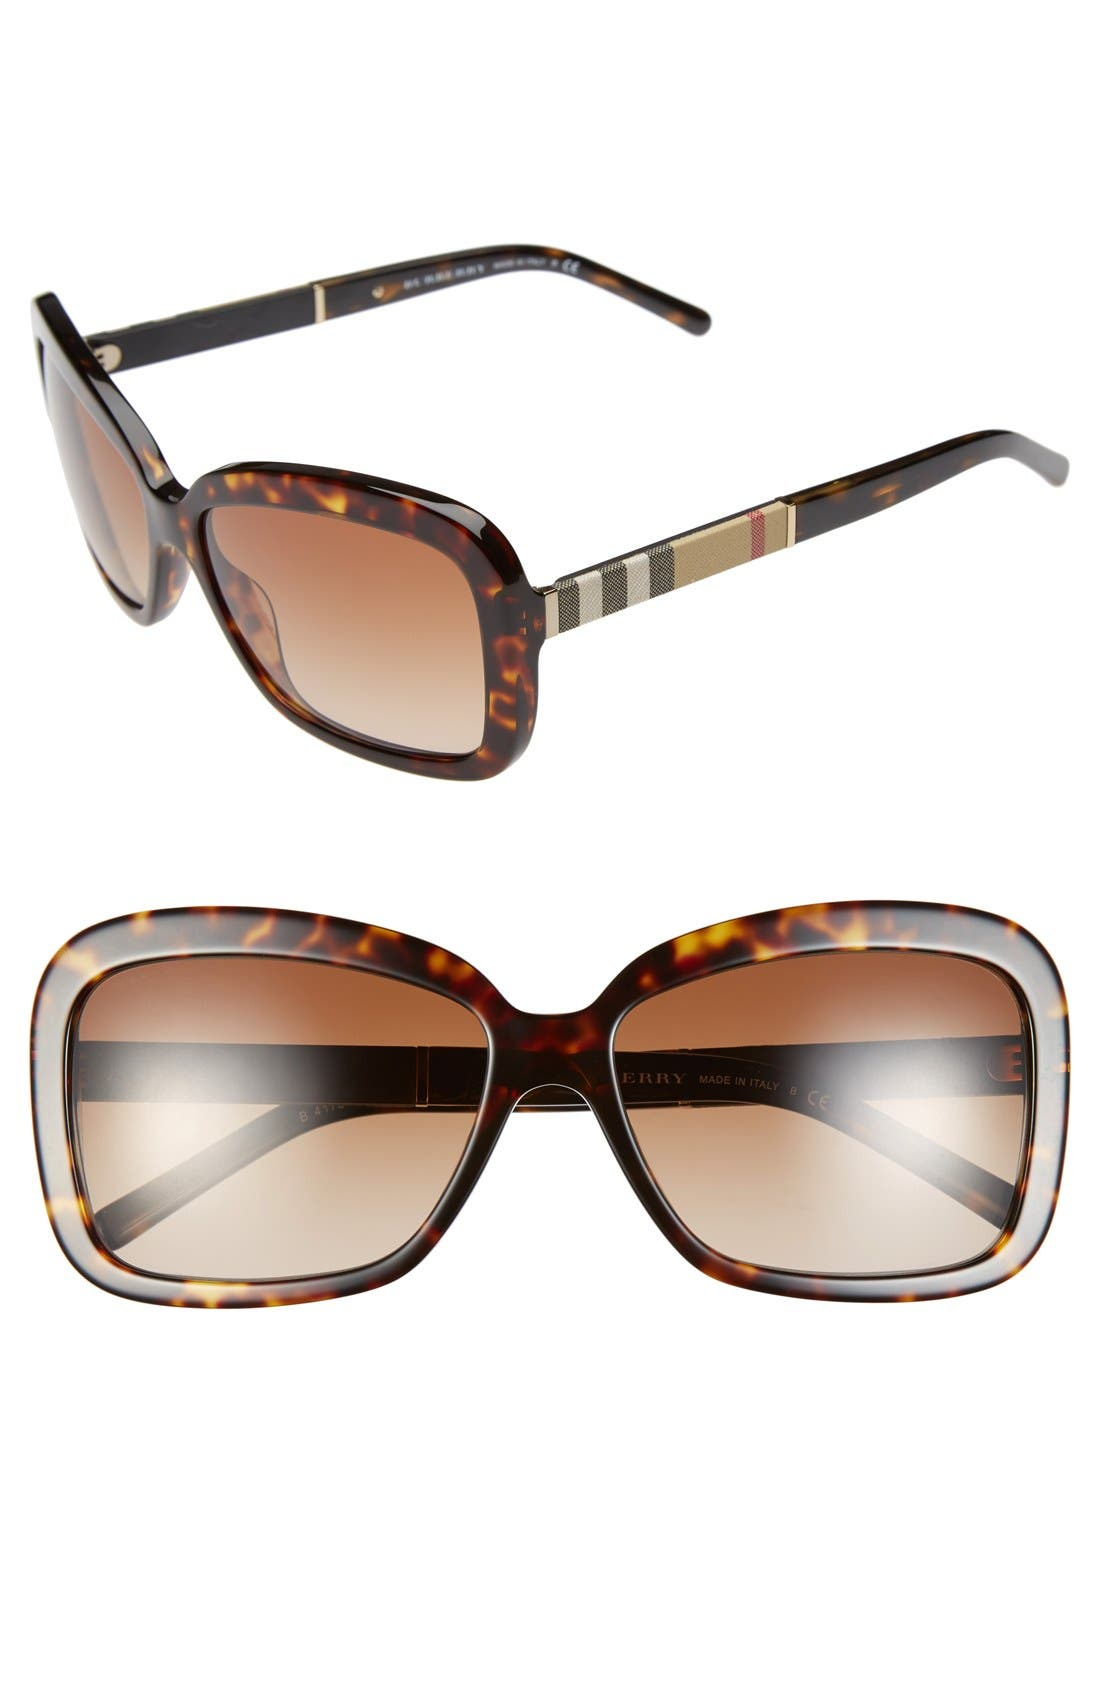 Main Image - Burberry 58mm Retro Sunglasses